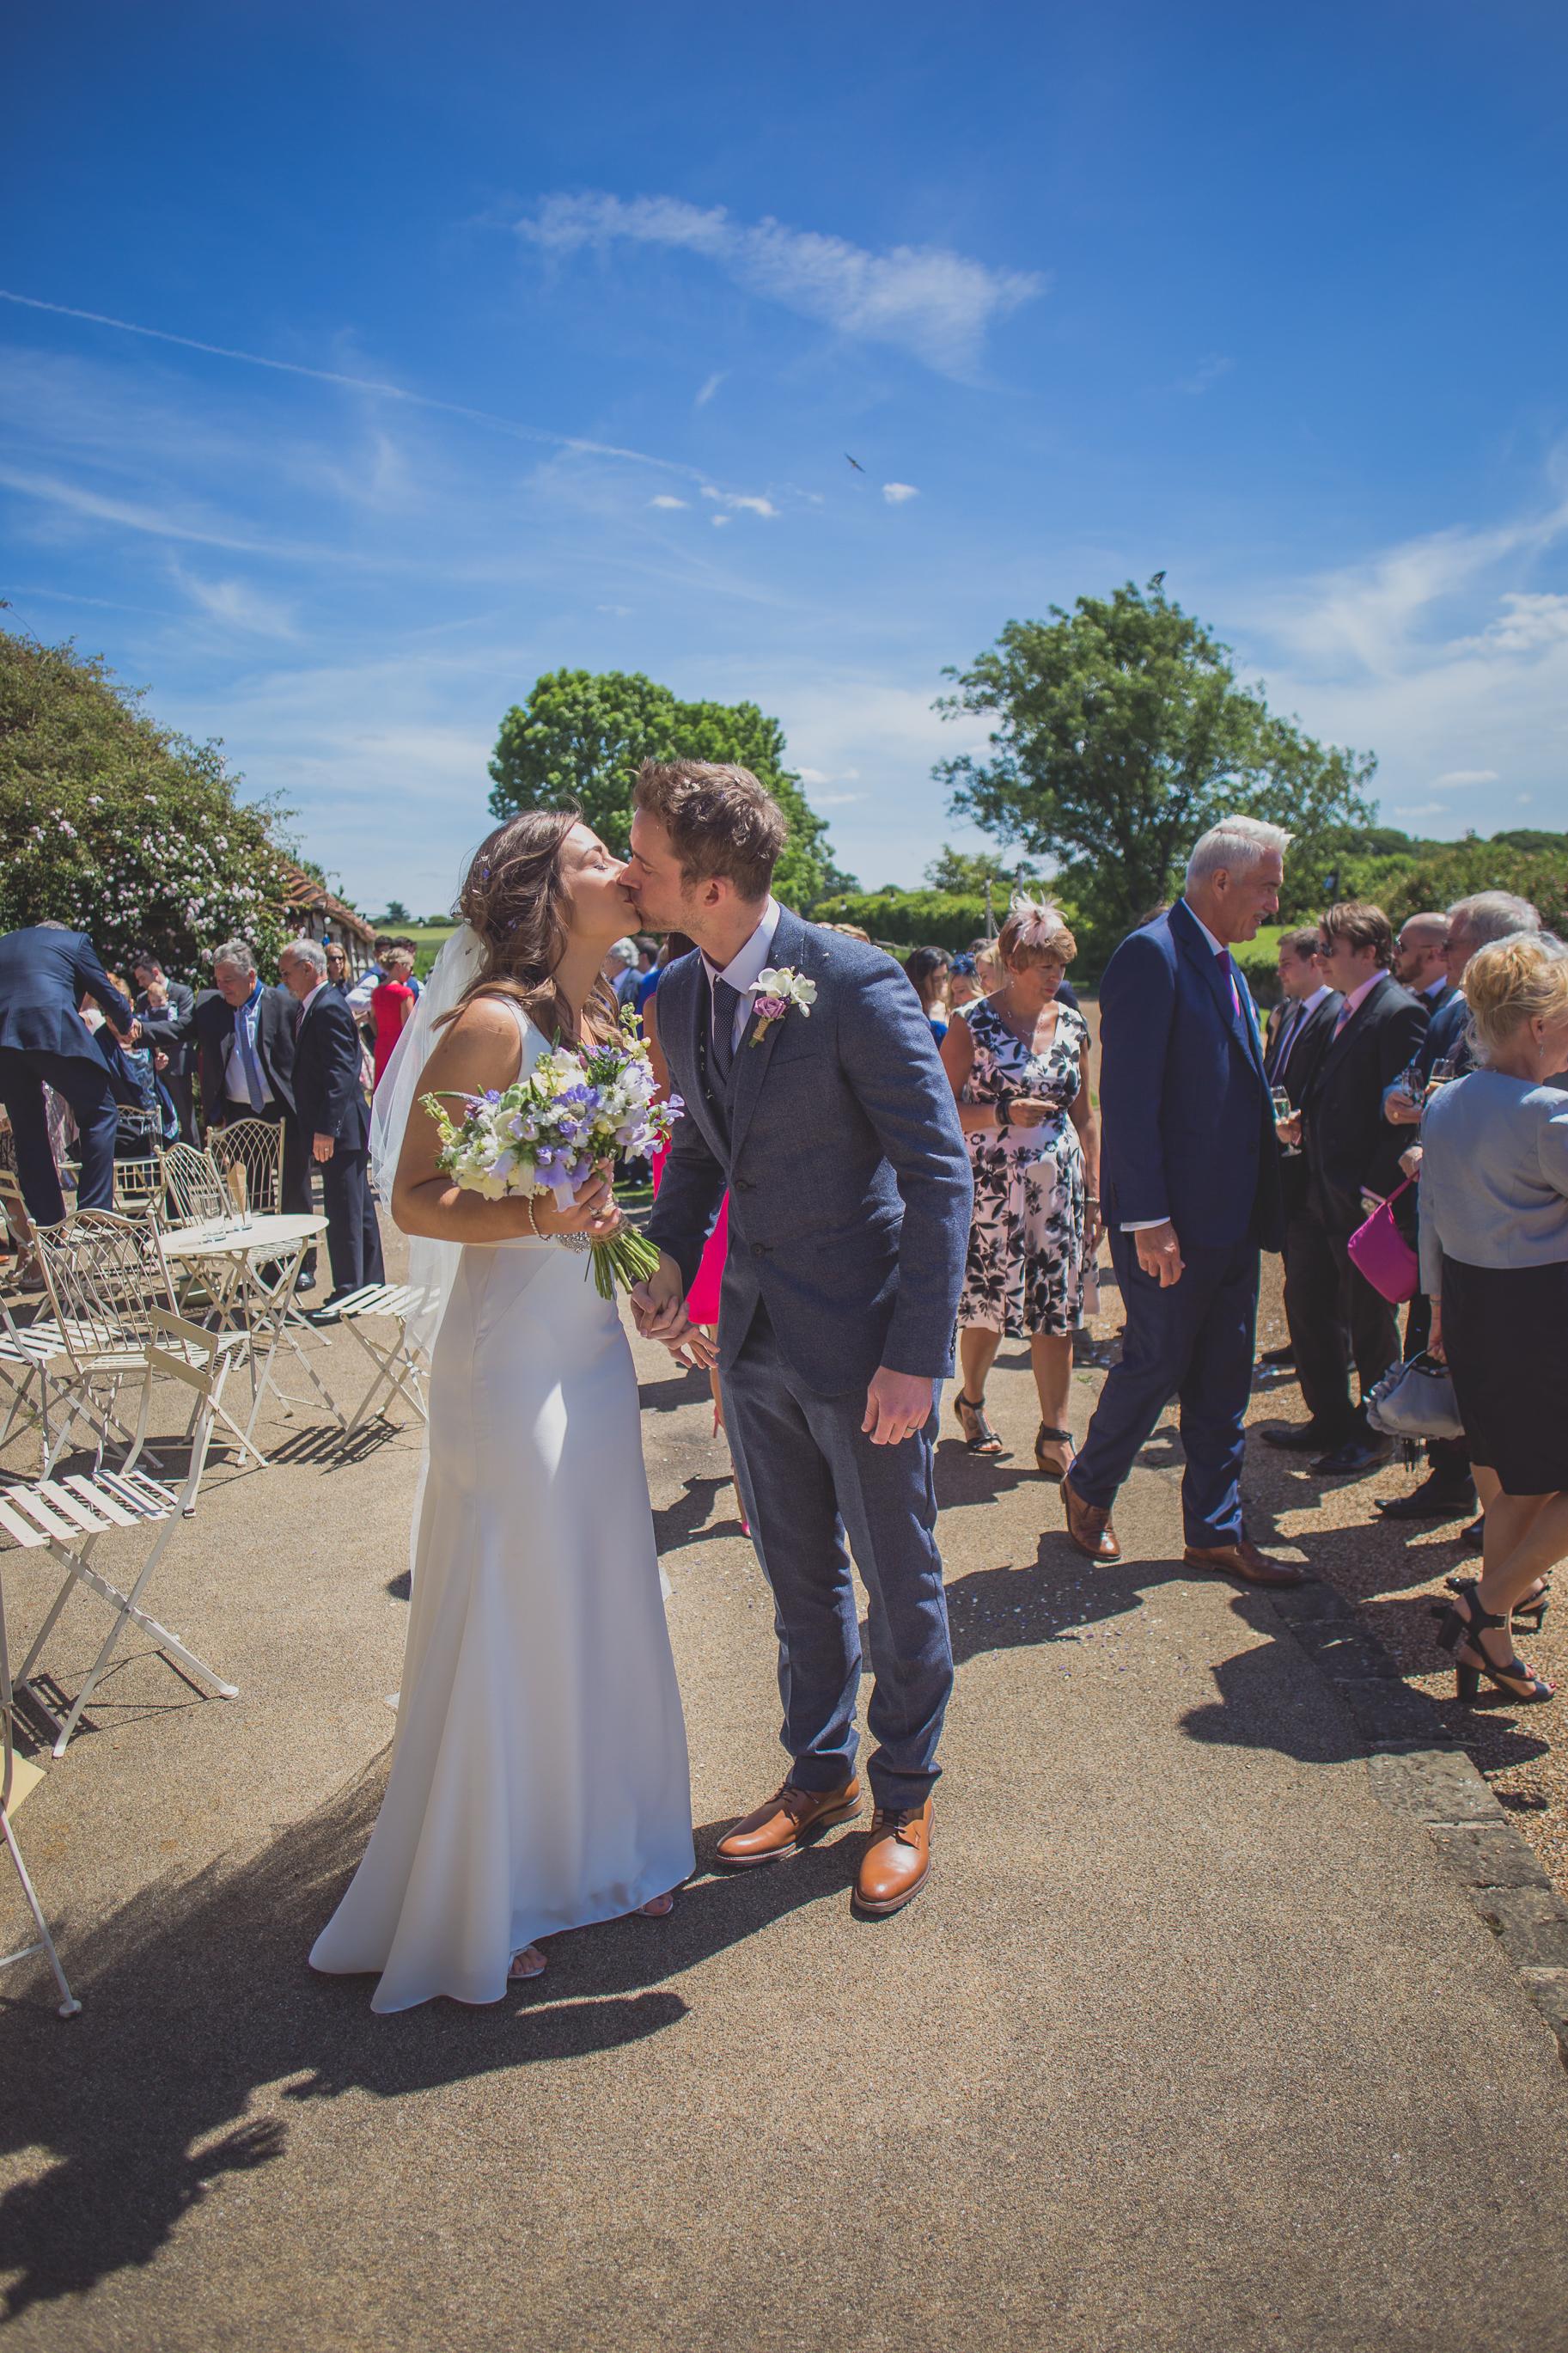 Grittenham Barn female wedding photographers west sussex petworth social-78.jpg